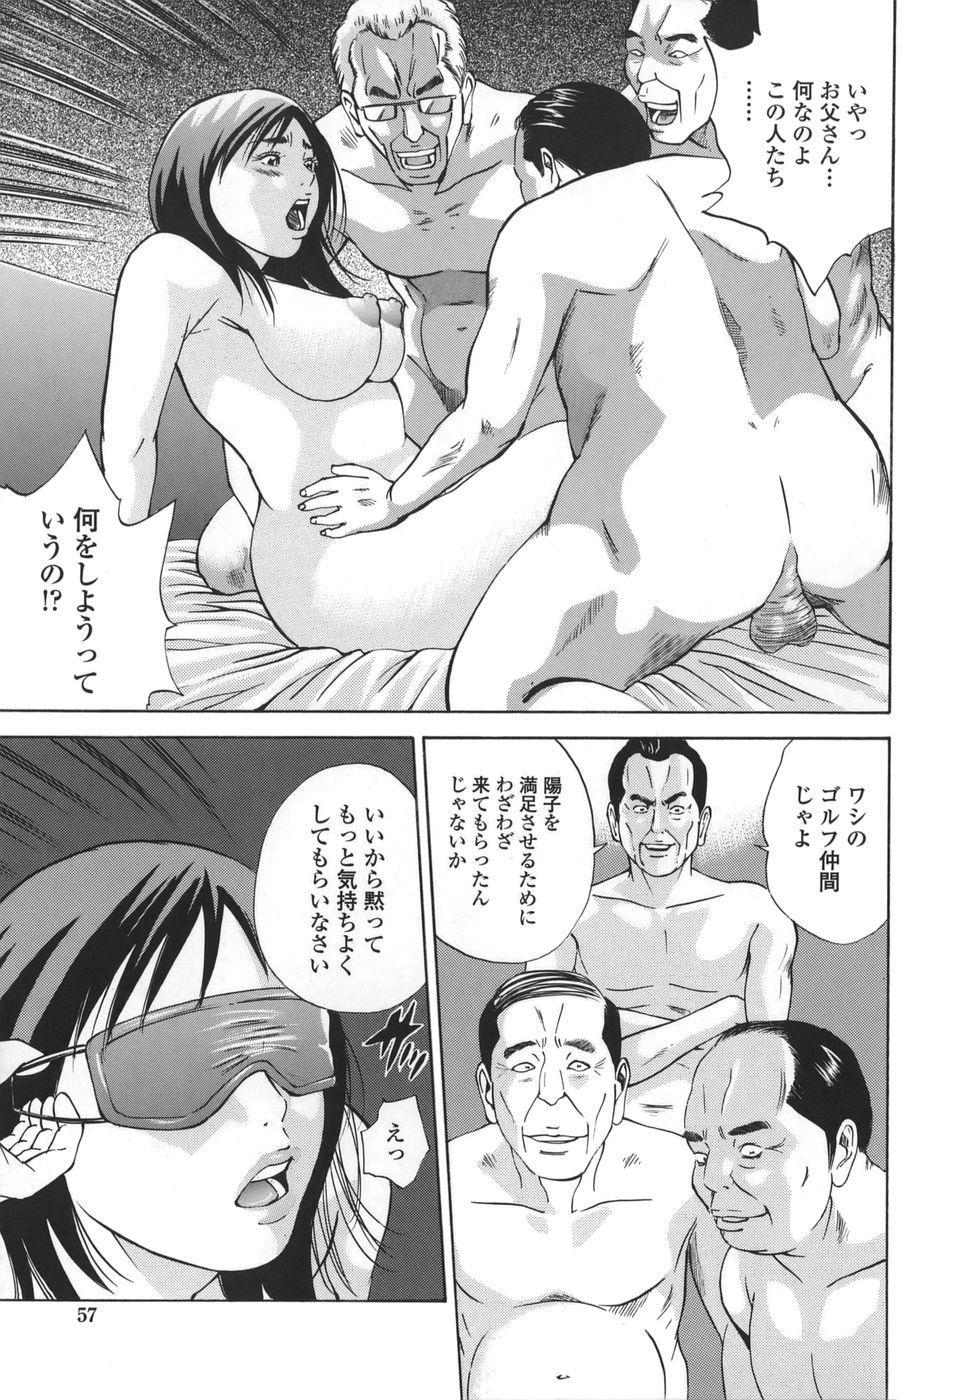 Kinshin Goukan - Near Relation Rapes 56